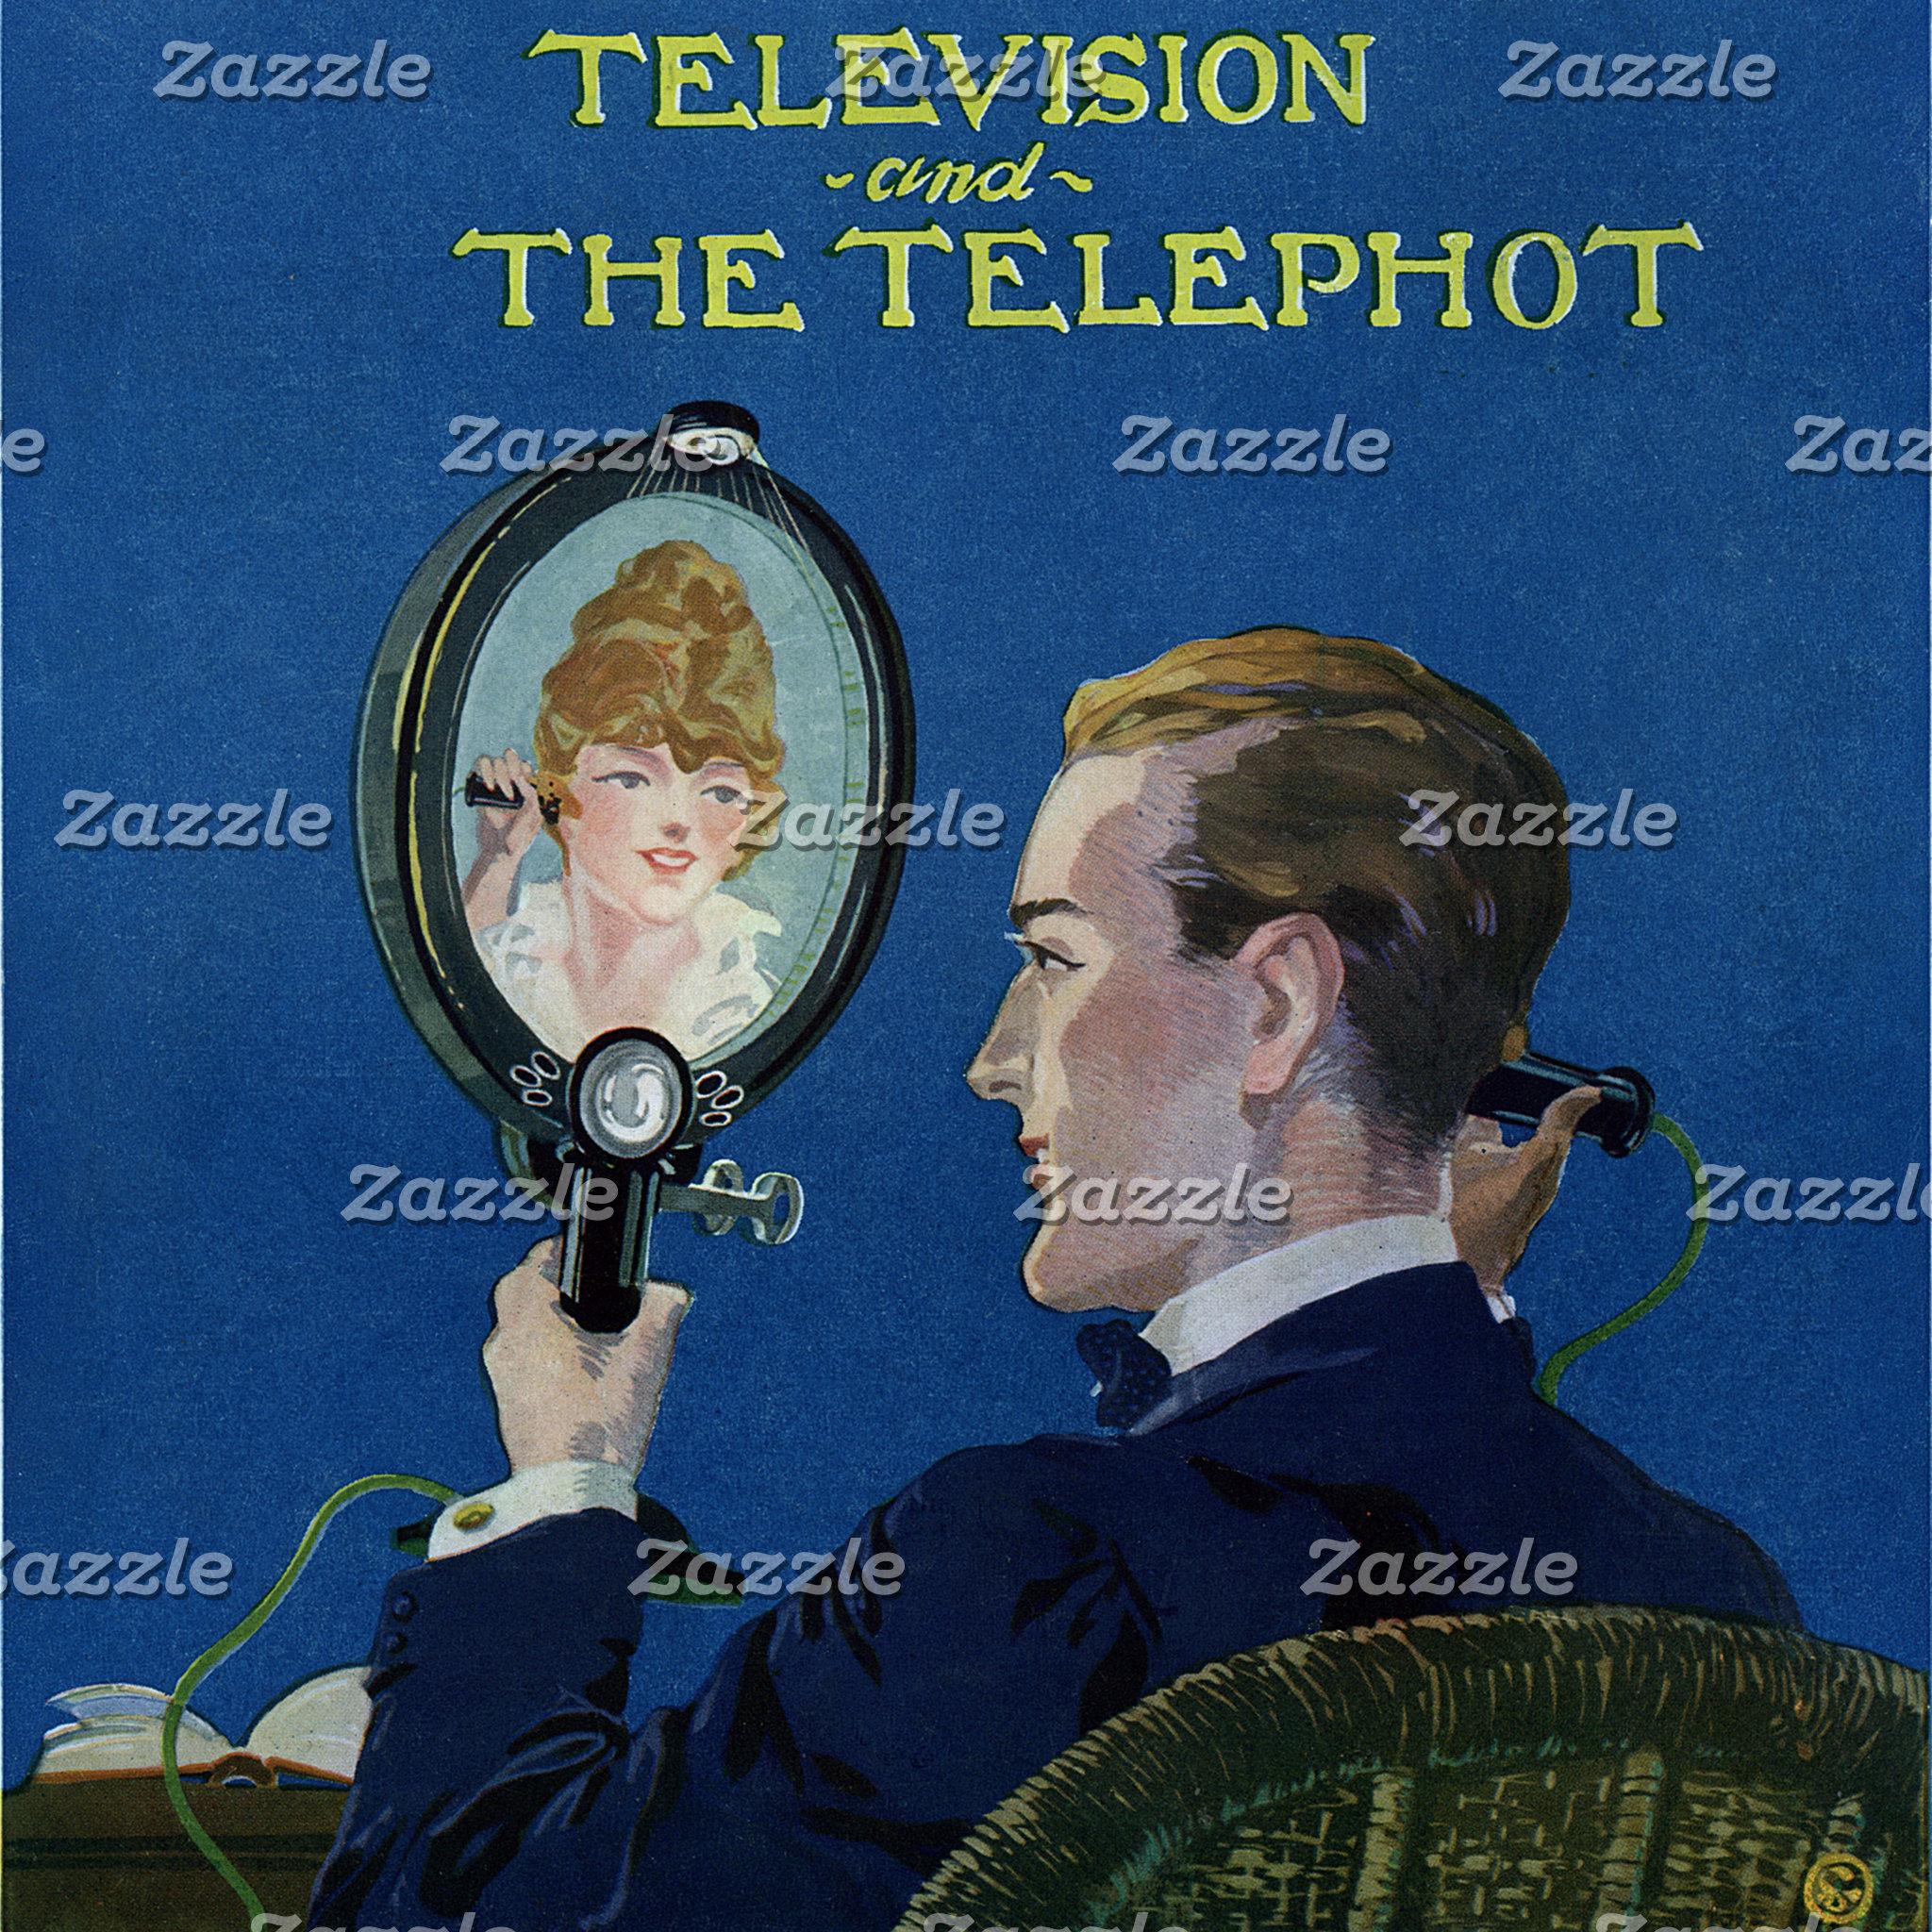 Television - Telephot